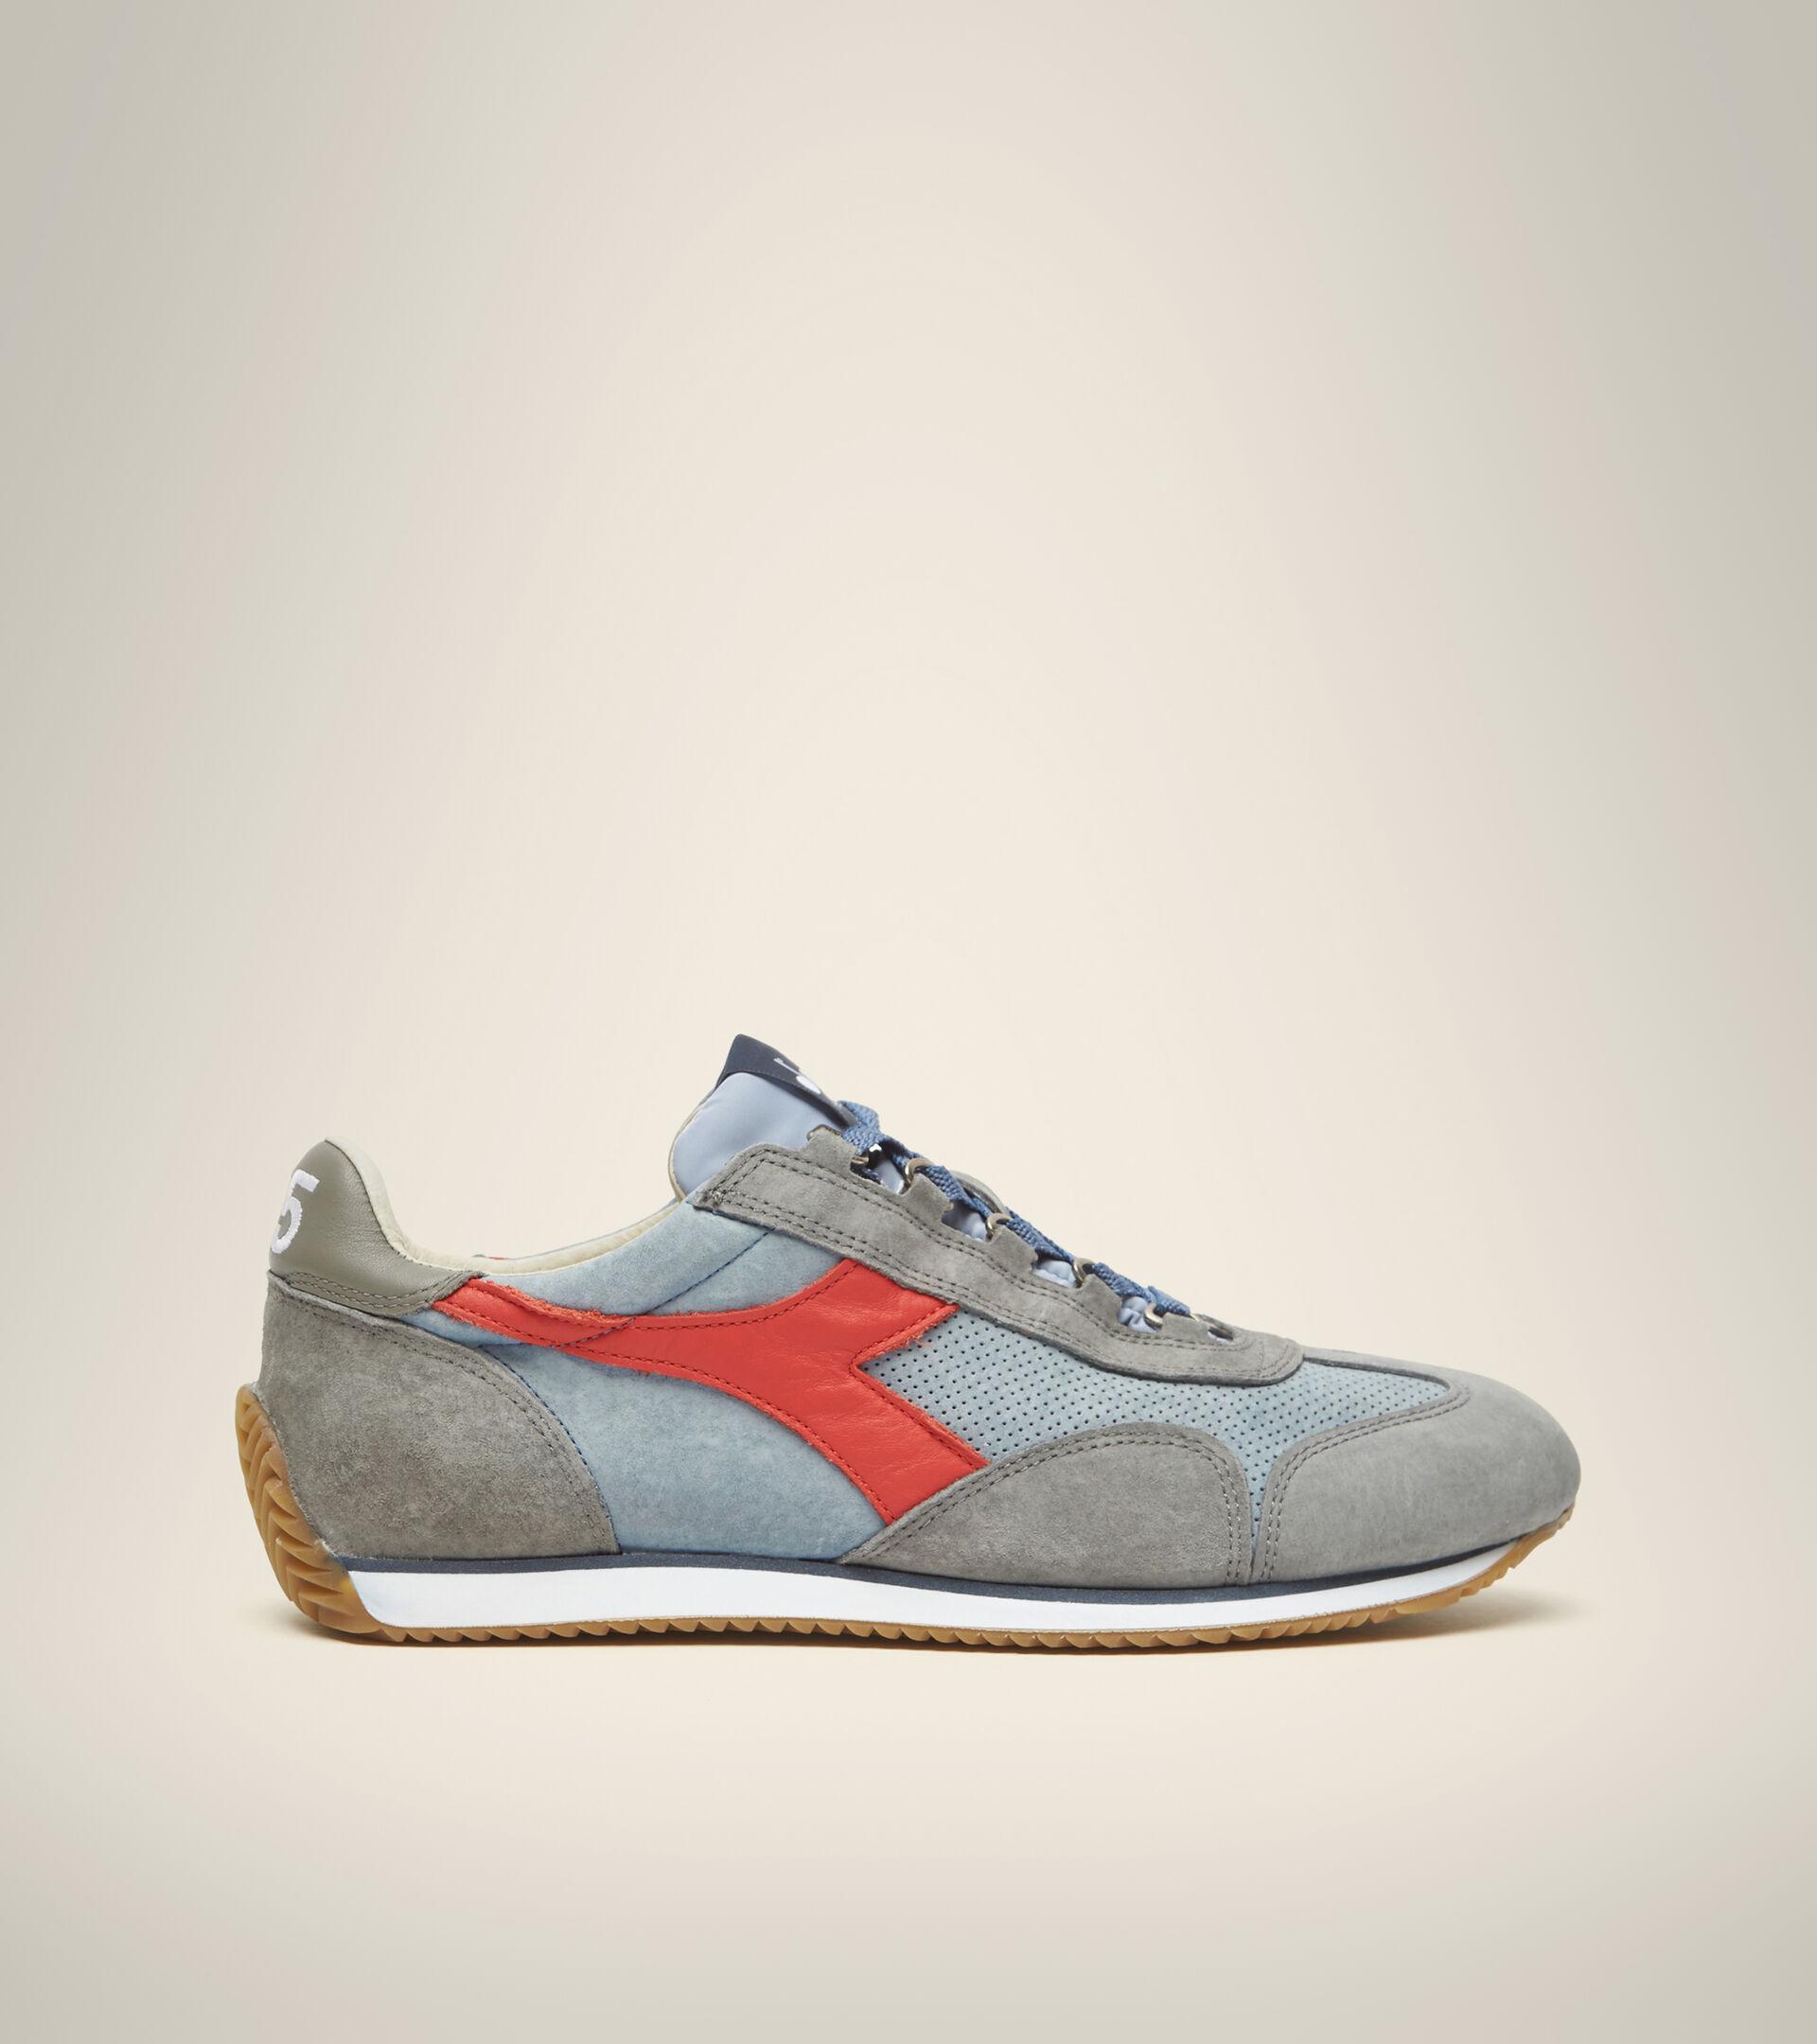 Footwear Heritage UNISEX EQUIPE SUEDE SW FADED DENIM BLUE Diadora